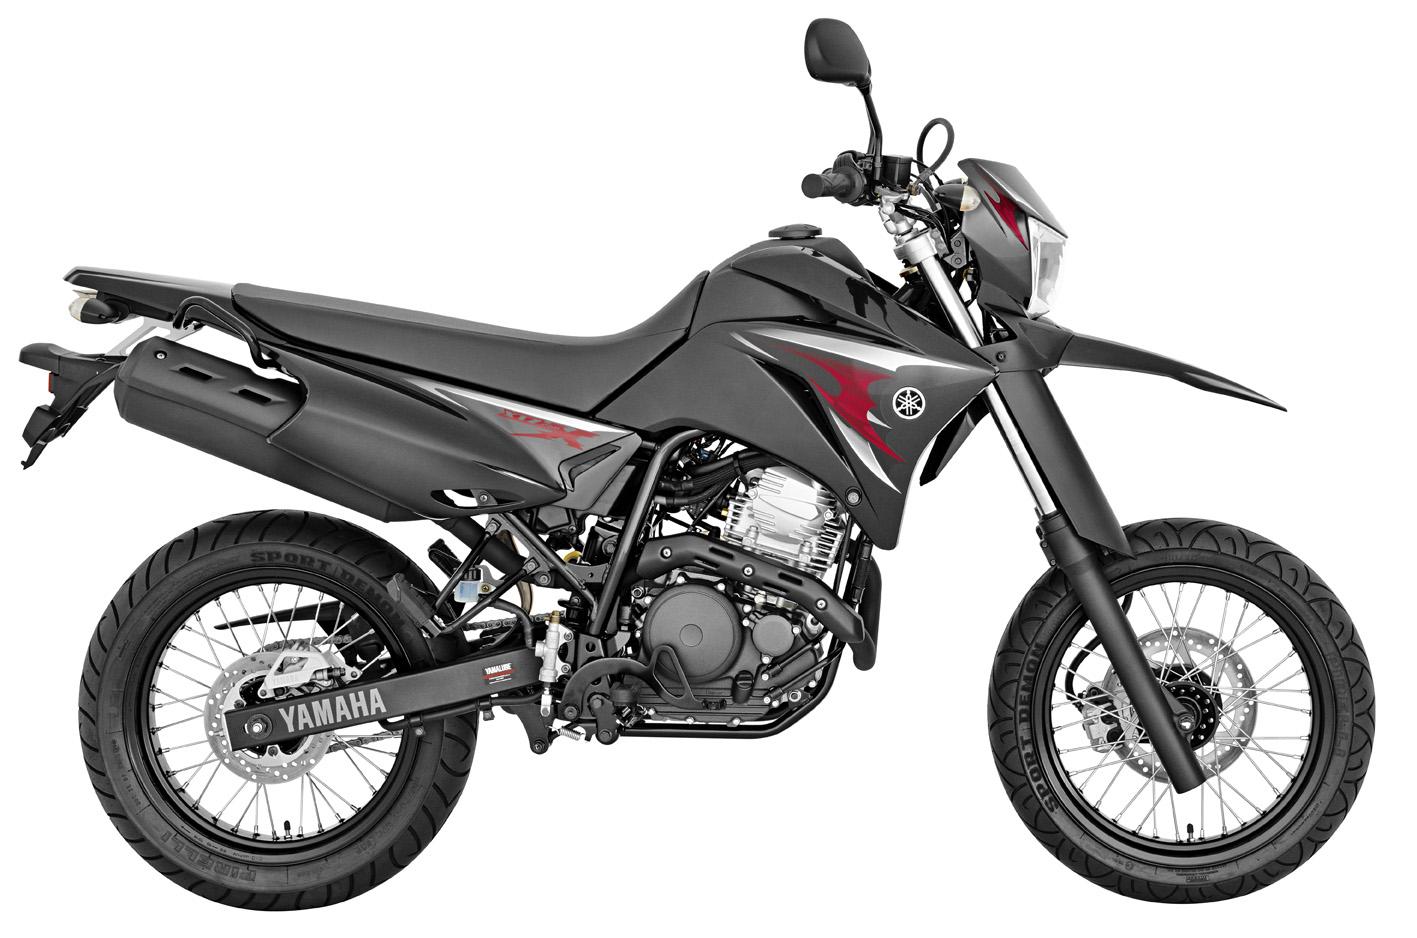 louco por motos yamaha lander 250x a pequena motard. Black Bedroom Furniture Sets. Home Design Ideas